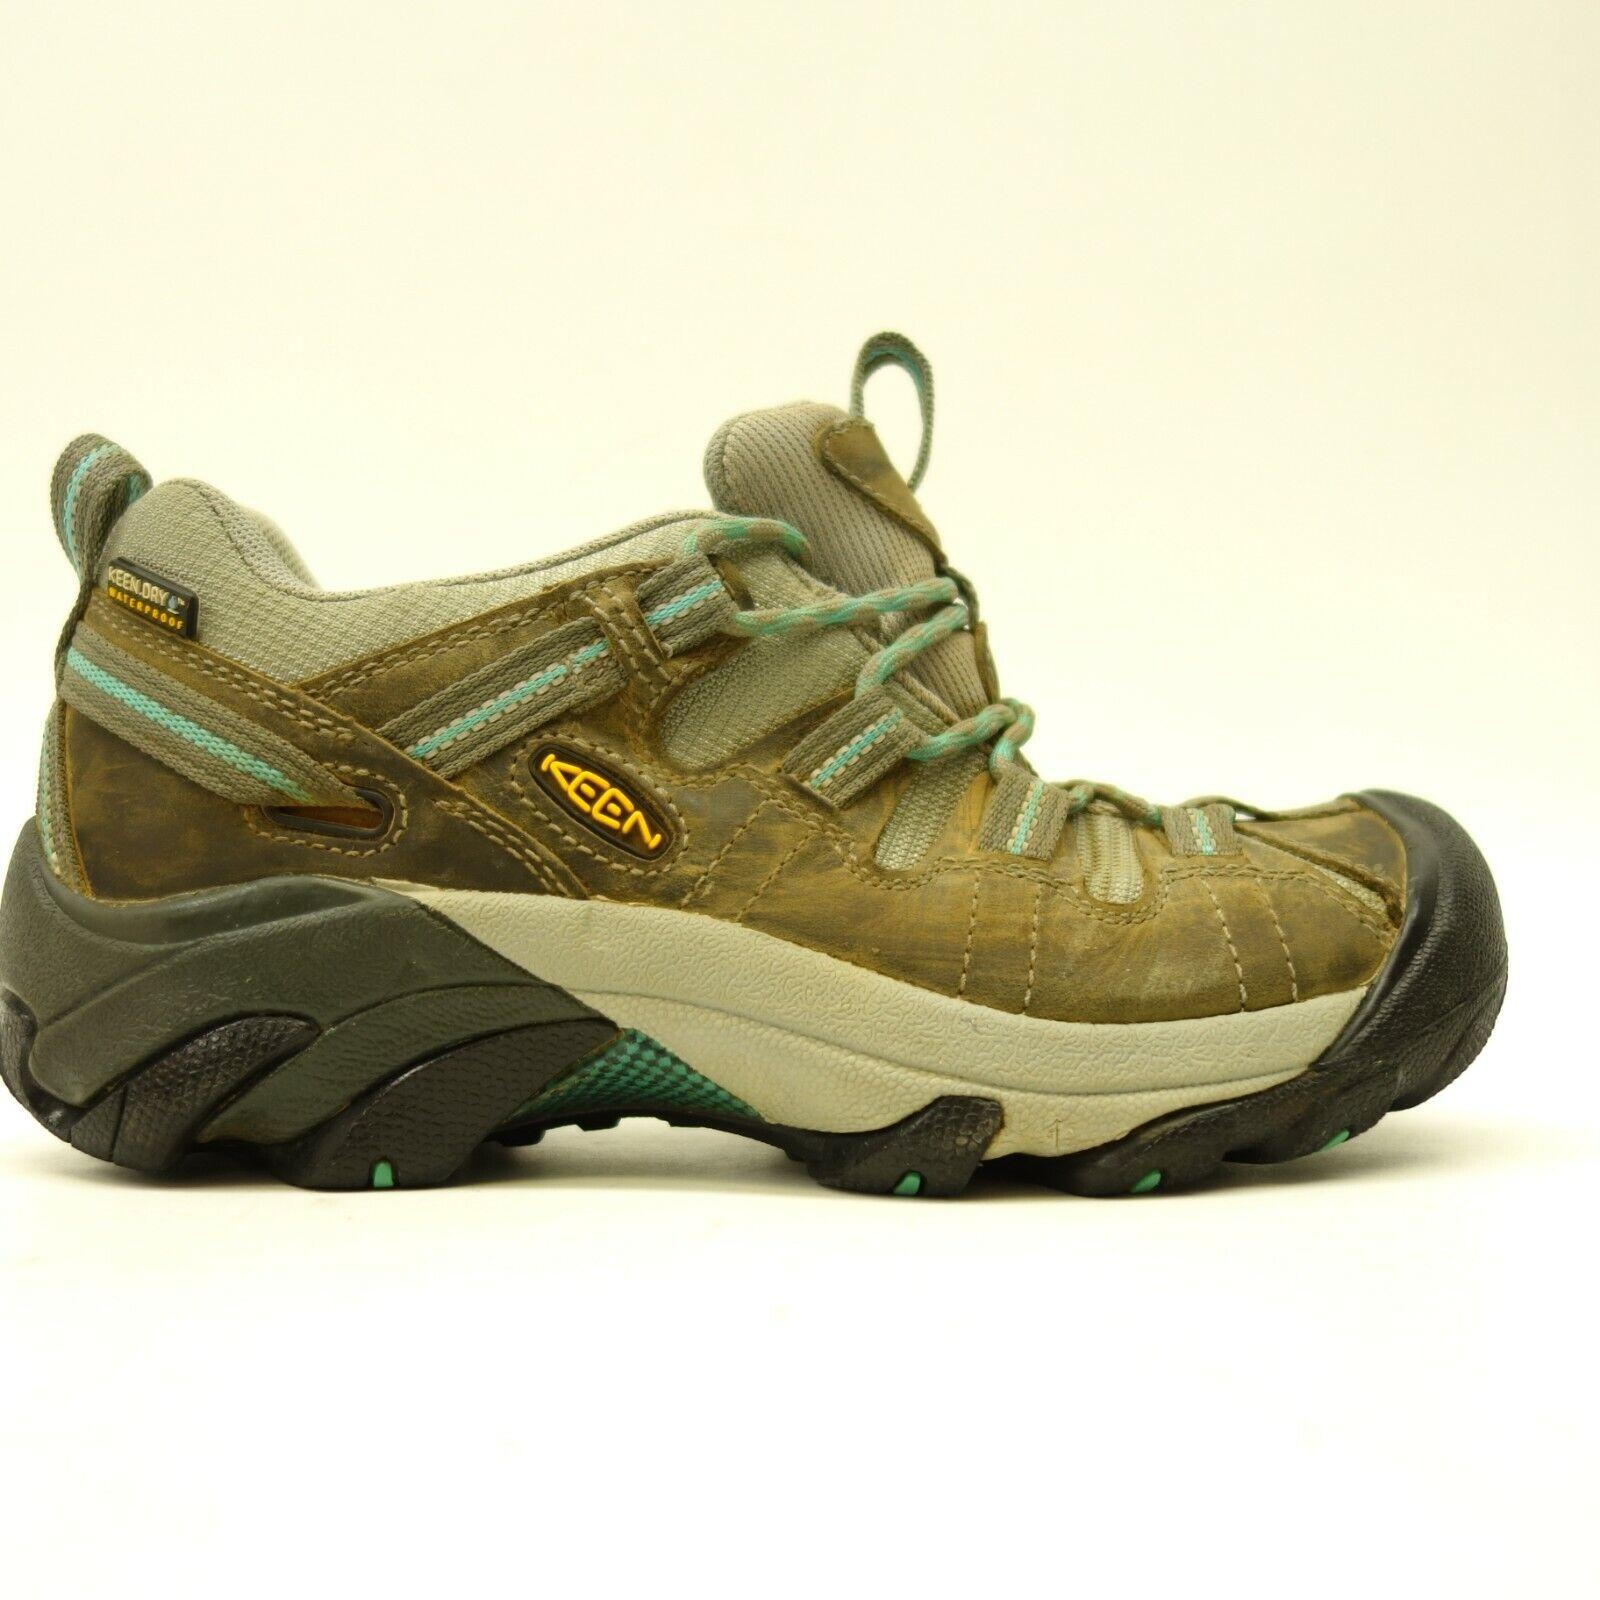 Keen Femmes Voyageur US 6.5 Eu 37 Cuir Athletic Support Chaussures Randonnée